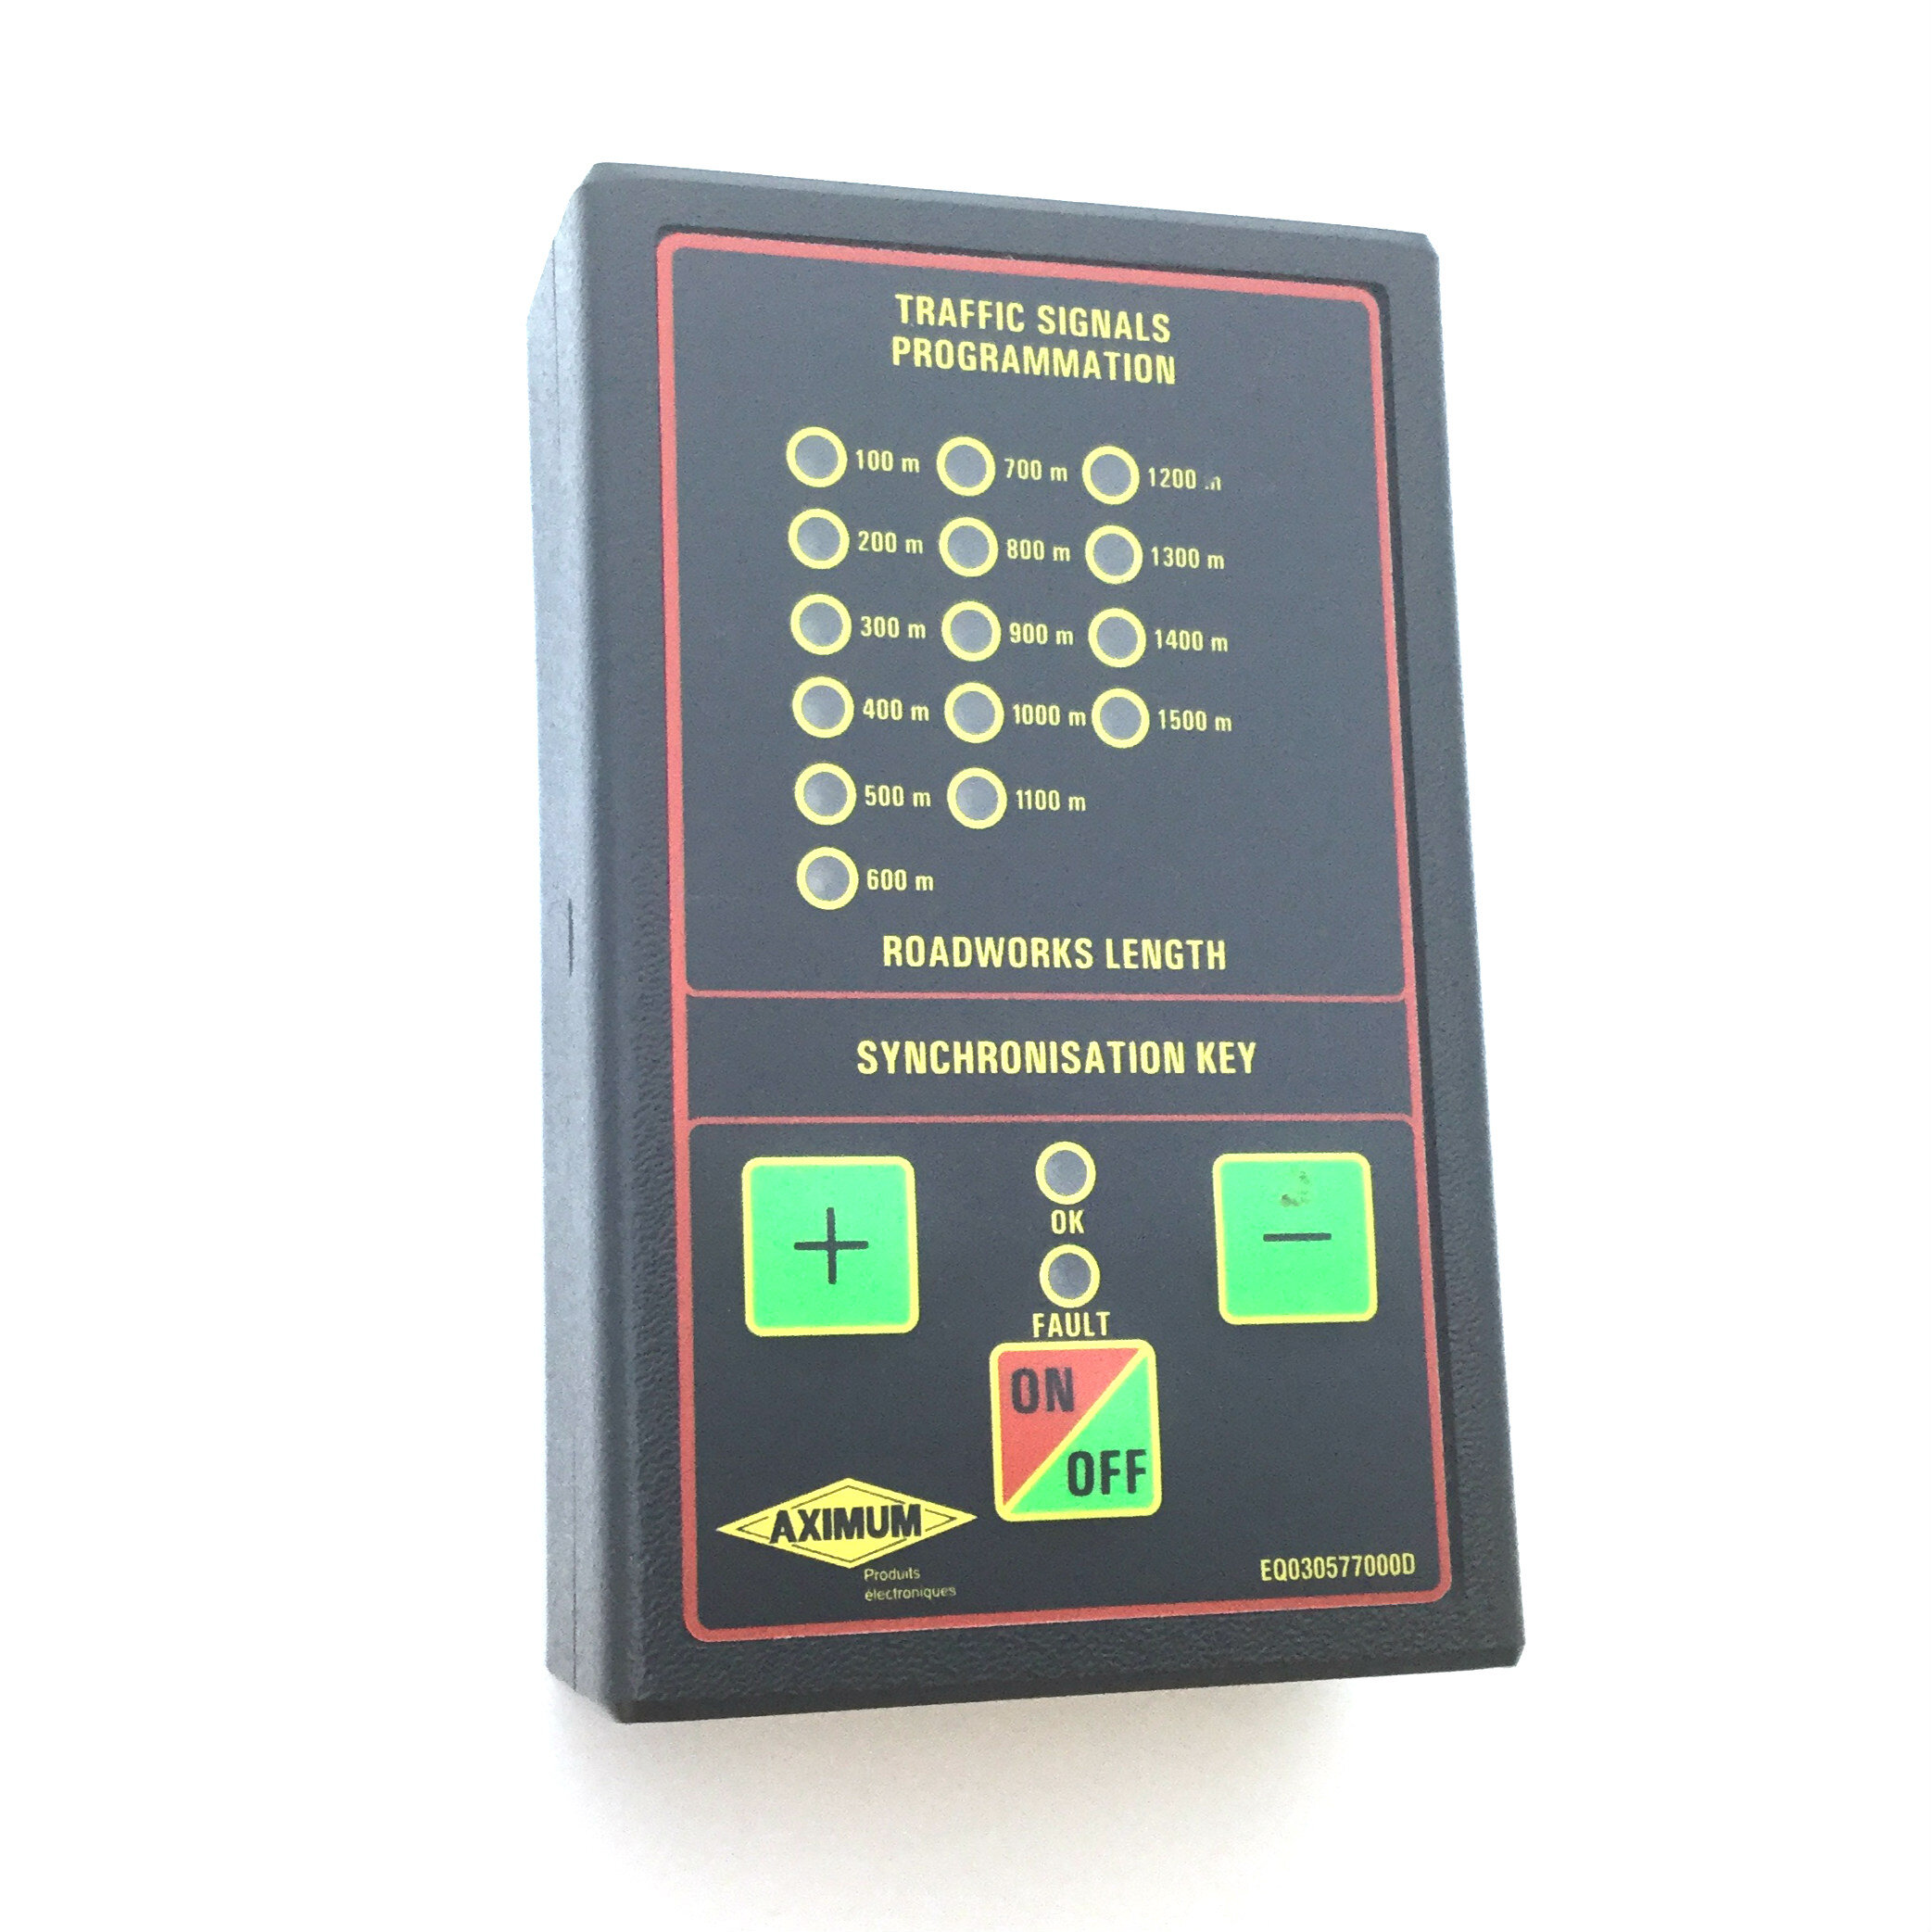 2 Way Module - Traffic Programming Key t/s Diabolux Traffic Lights